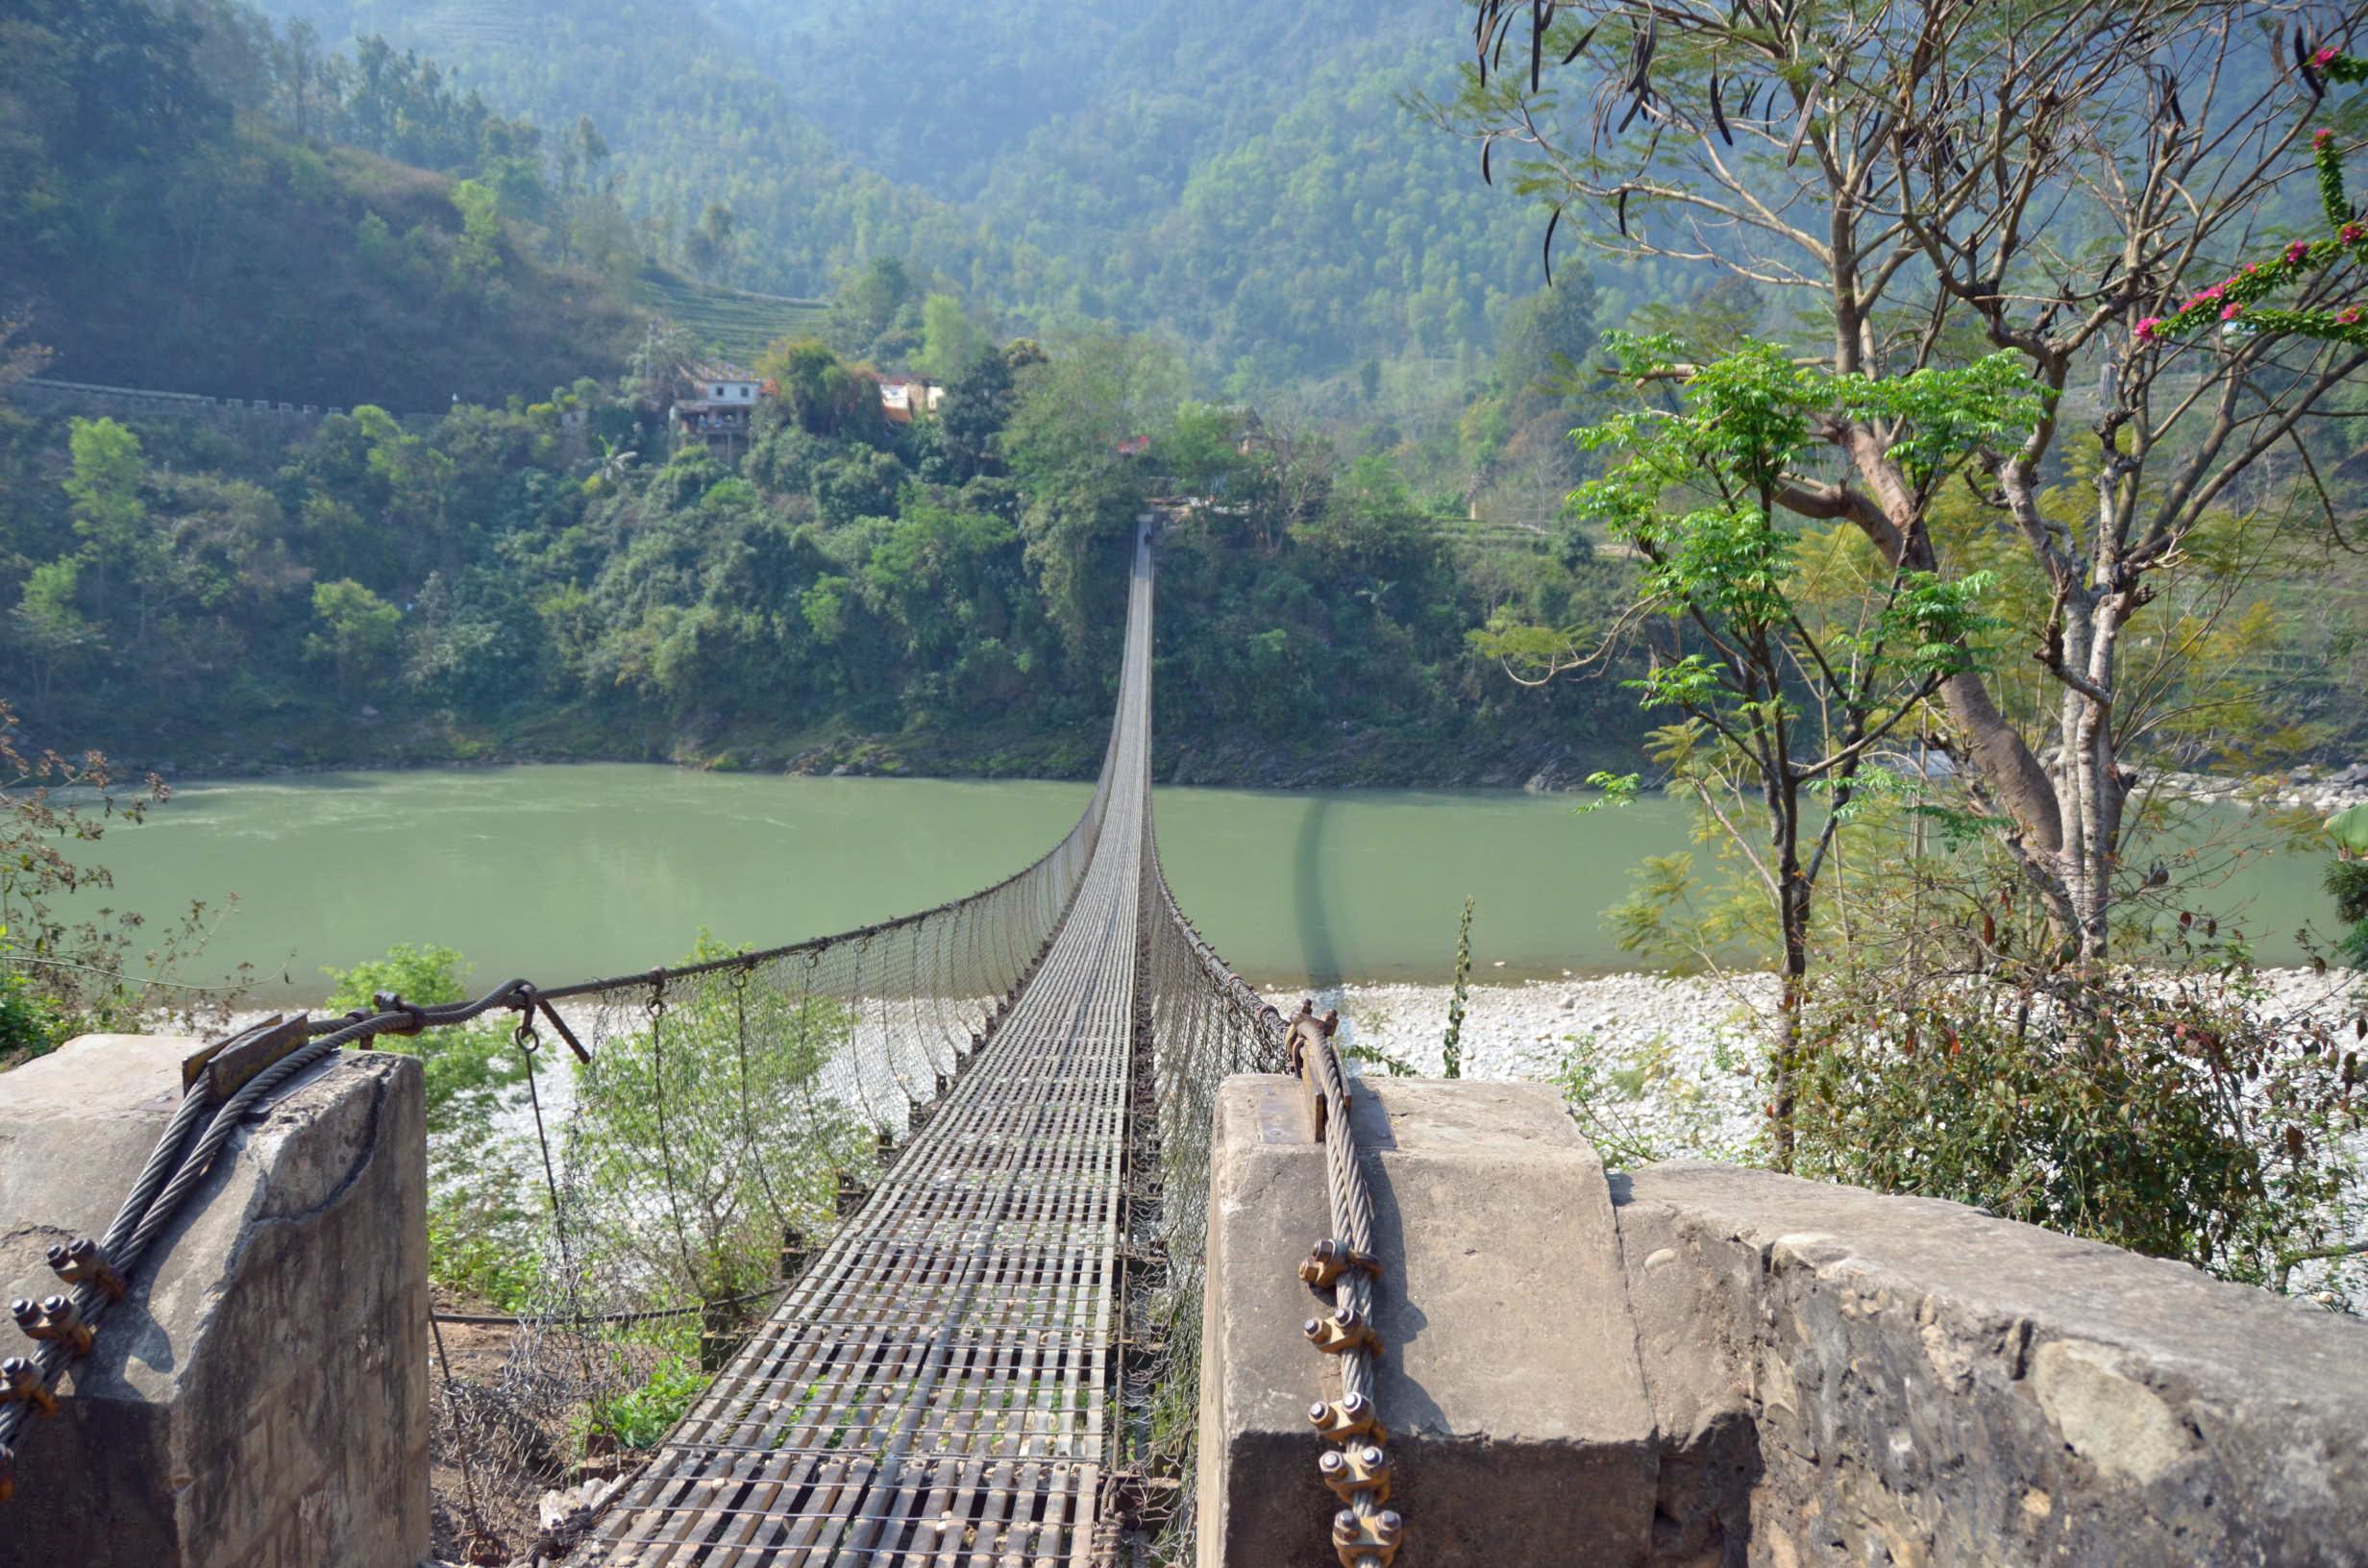 mck-3-21-15-river-suspension-bridge-DSC_1133.jpg